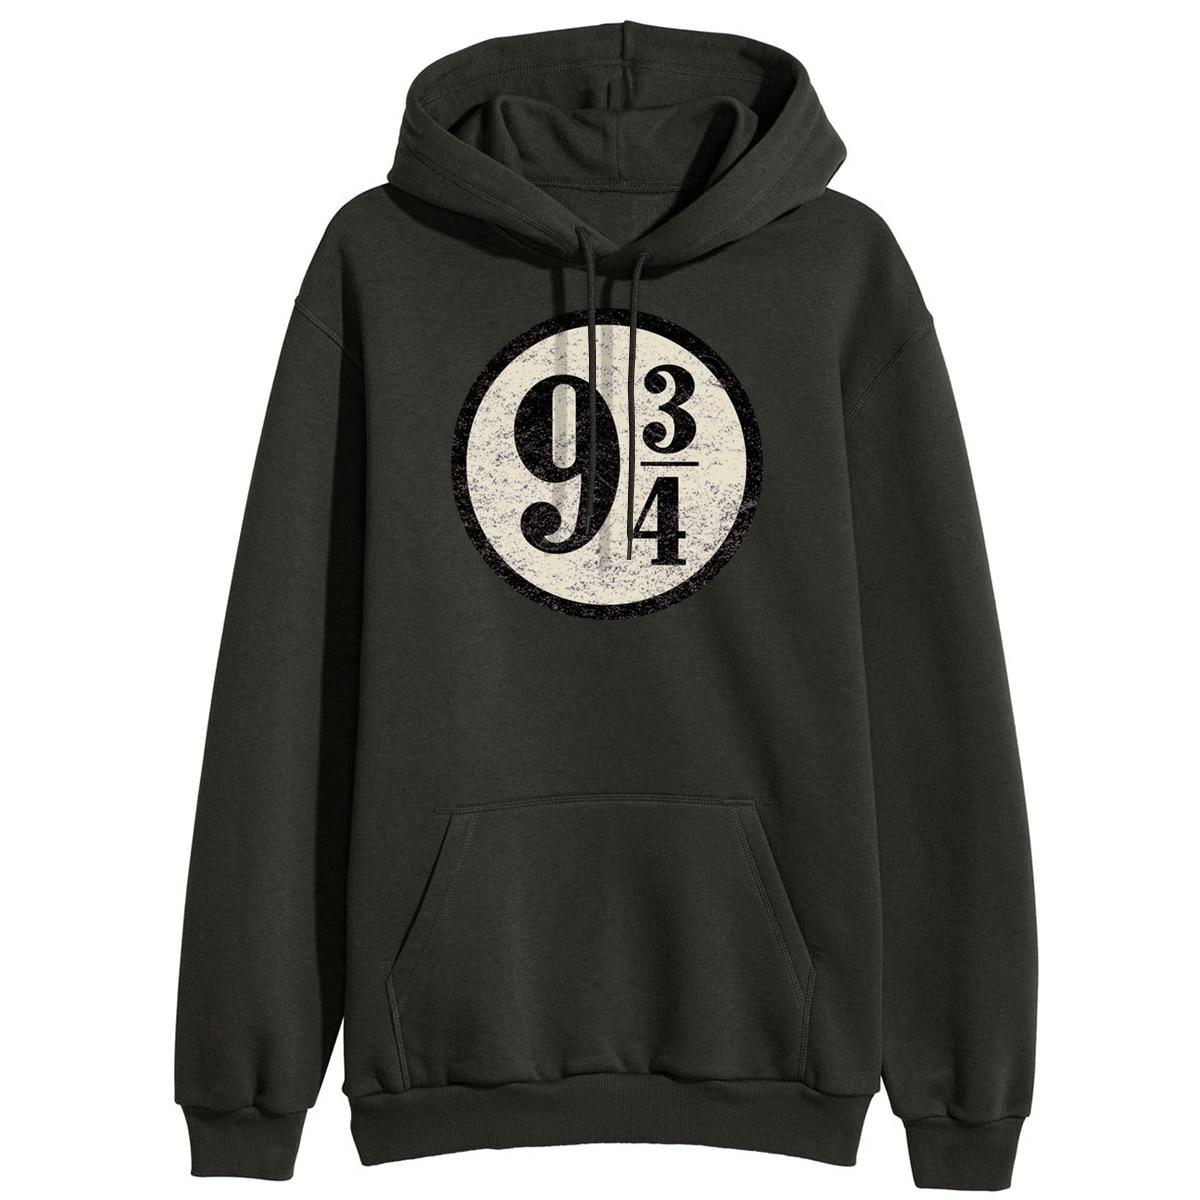 Women Black Hoodies Winter Sweatshirts Platform 9-3/4 Hogwarts Hoodies 2019 Women New Arrival Letter Casual Outerwear Pullover